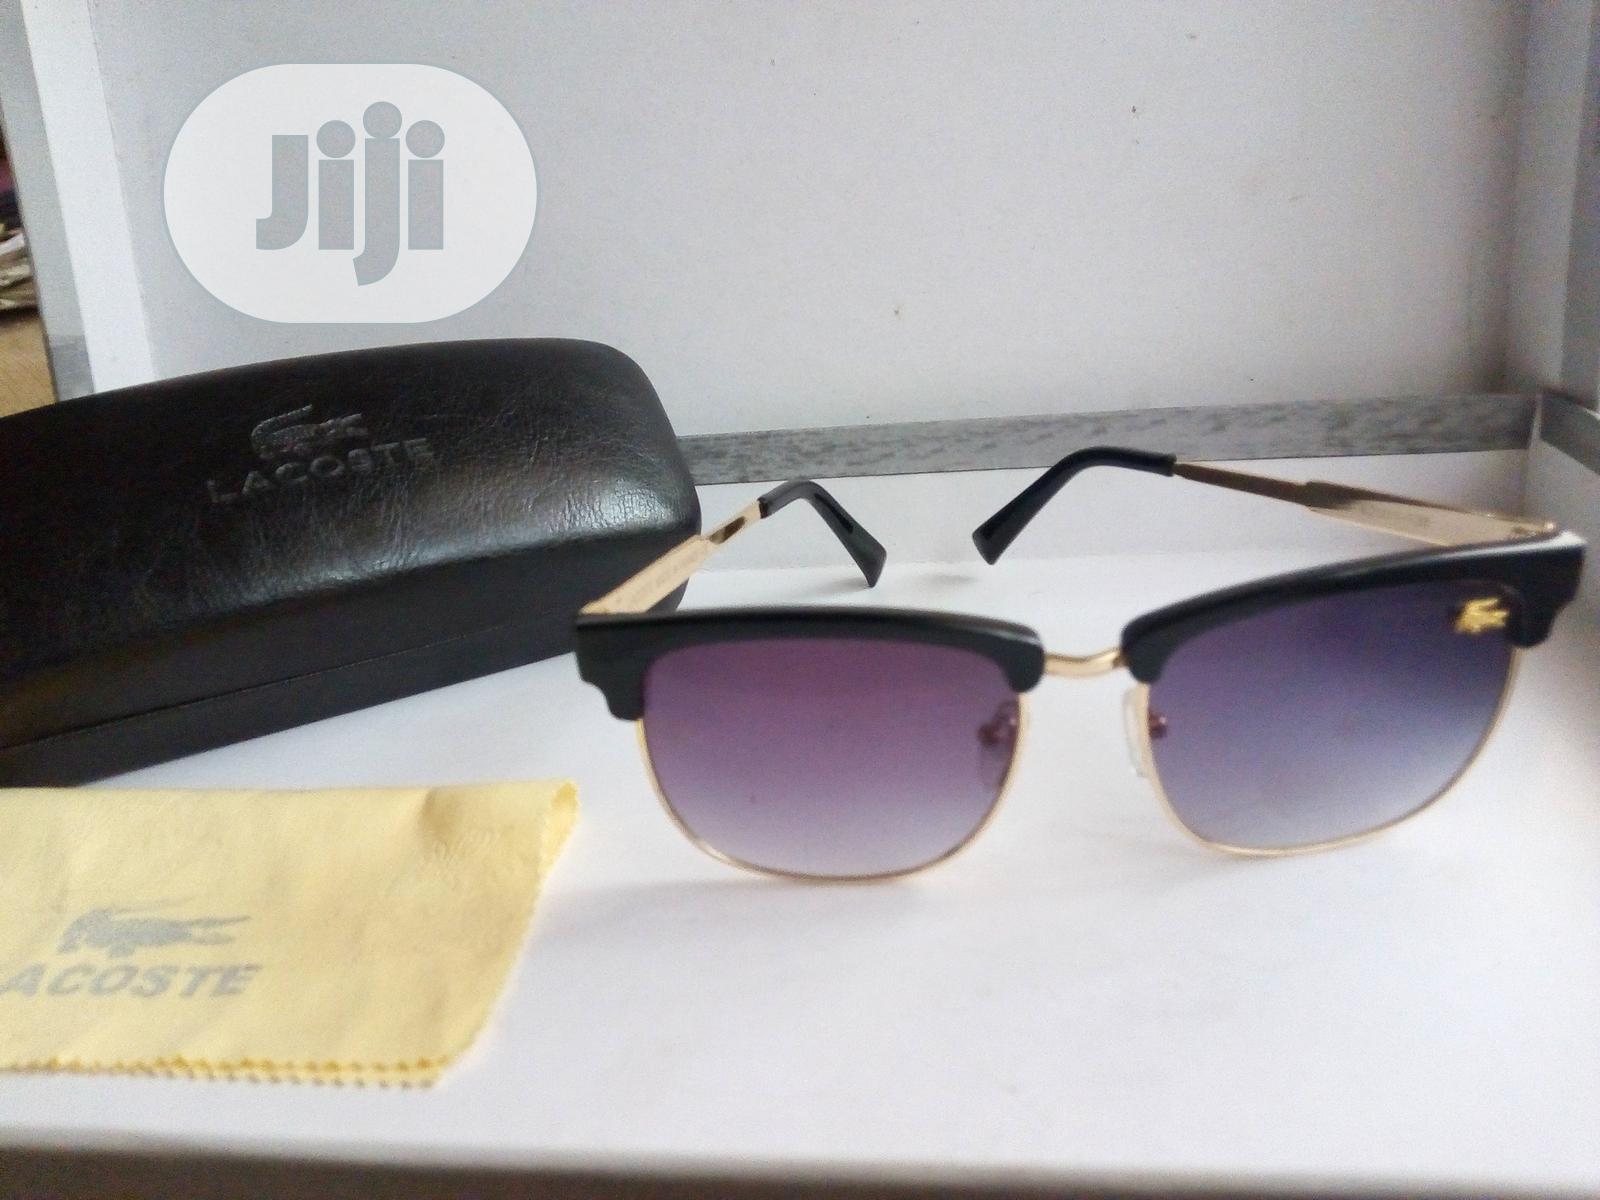 30% Off! Lacoste Men's Sunglasses